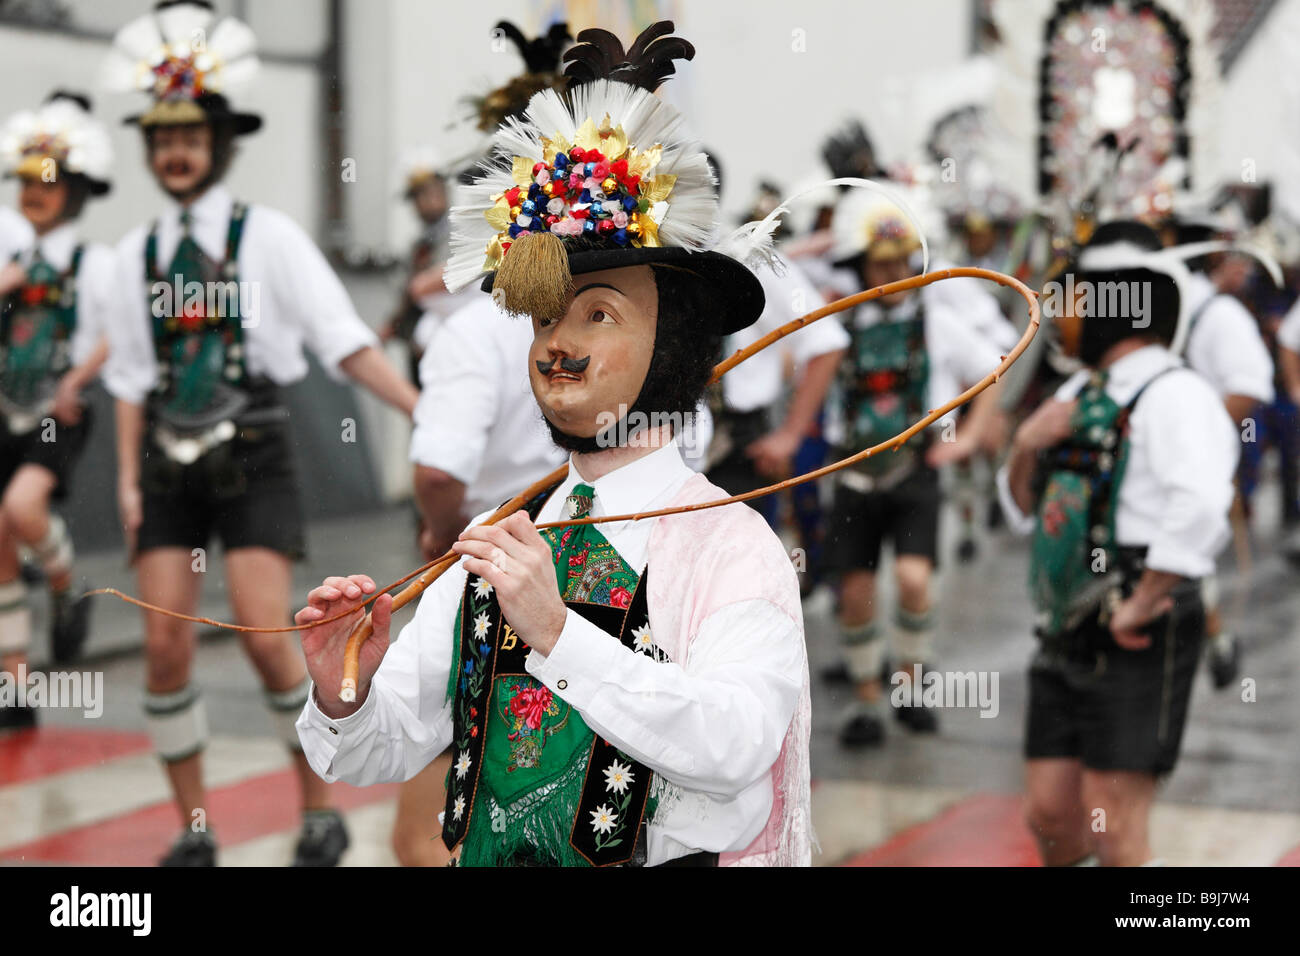 Desfile en Mullerlaufen Thaur, tradición carnavalesca, Tirol, Austria Imagen De Stock